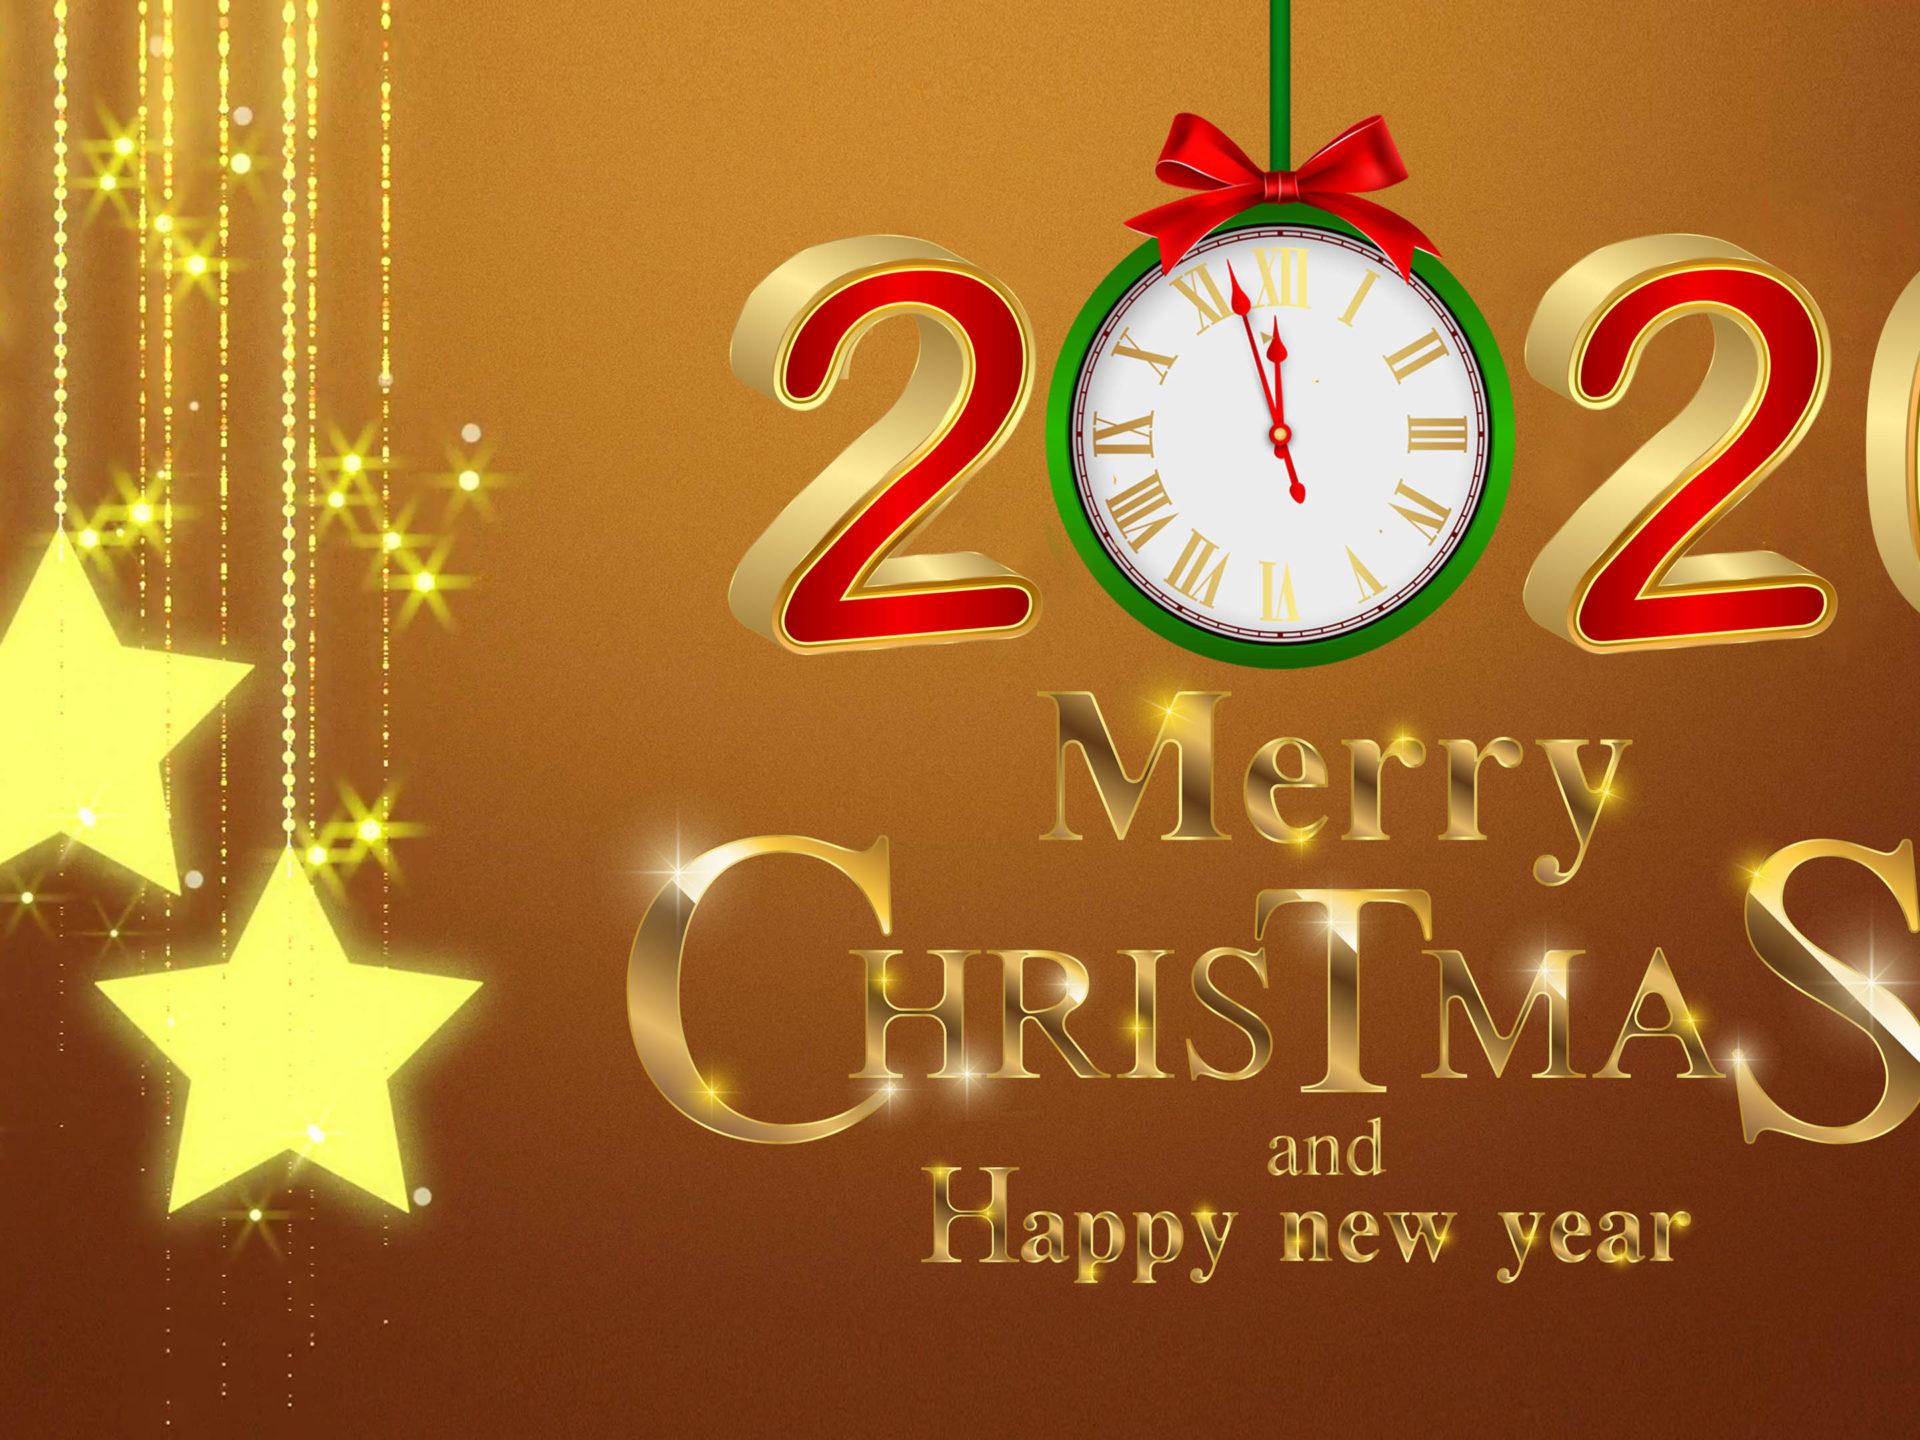 38] Happy Christmas 2020 Wallpapers on WallpaperSafari 1920x1440